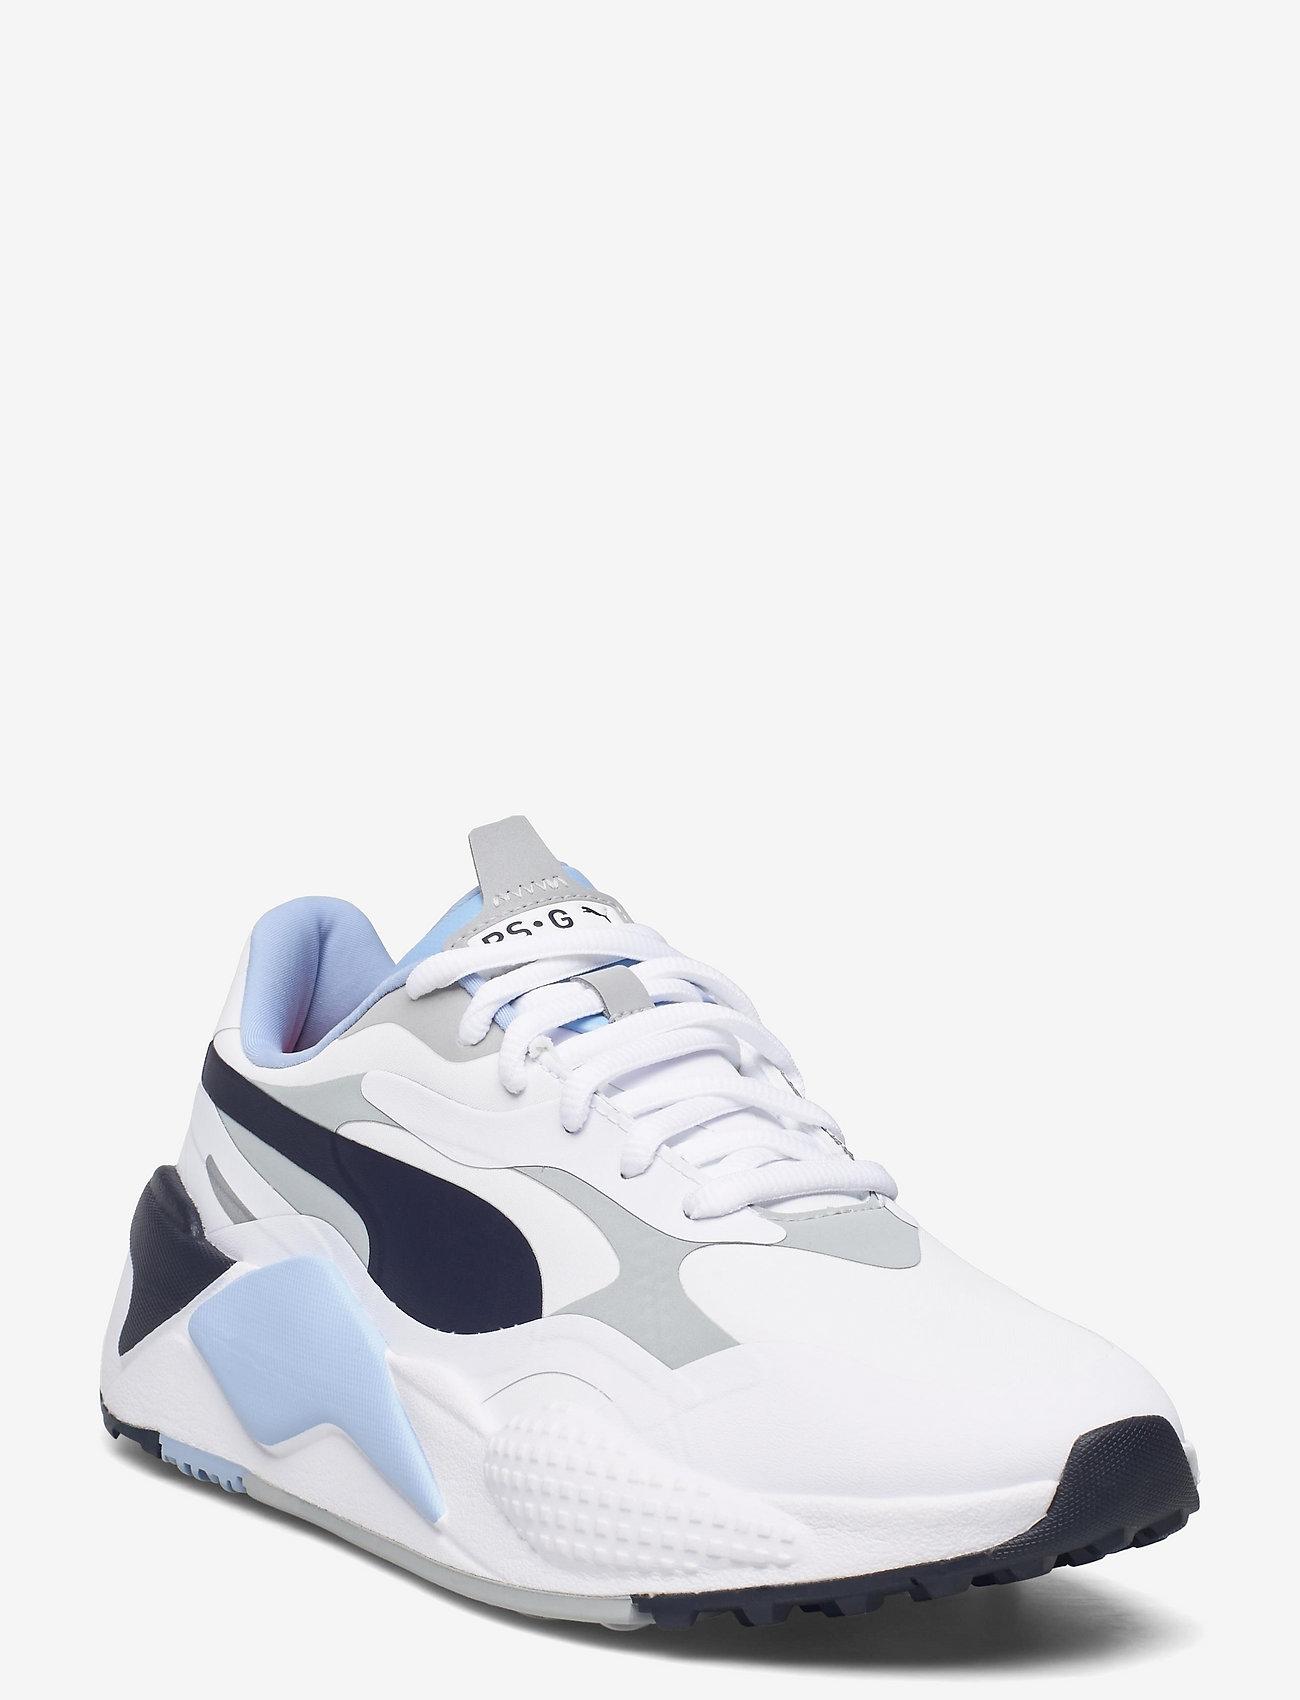 PUMA Golf - RS-G - golfschoenen - puma white-navy blazer-placid blue - 0